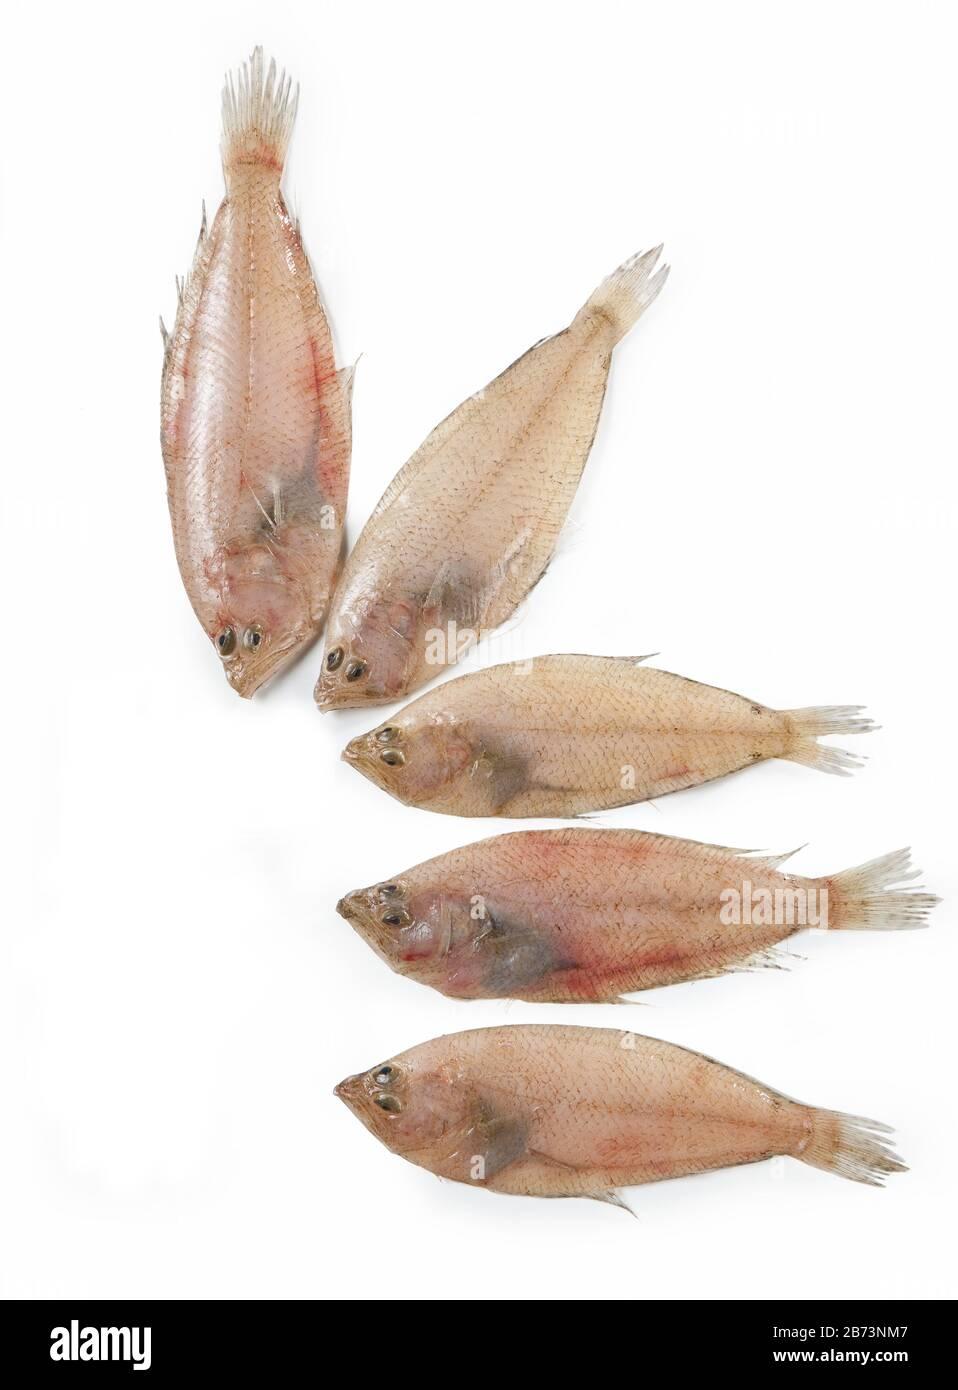 Platija europea, pez plano, Platichthys flesus, Pande, pescado mediterráneo, aislado sobre fondo blanco Foto de stock